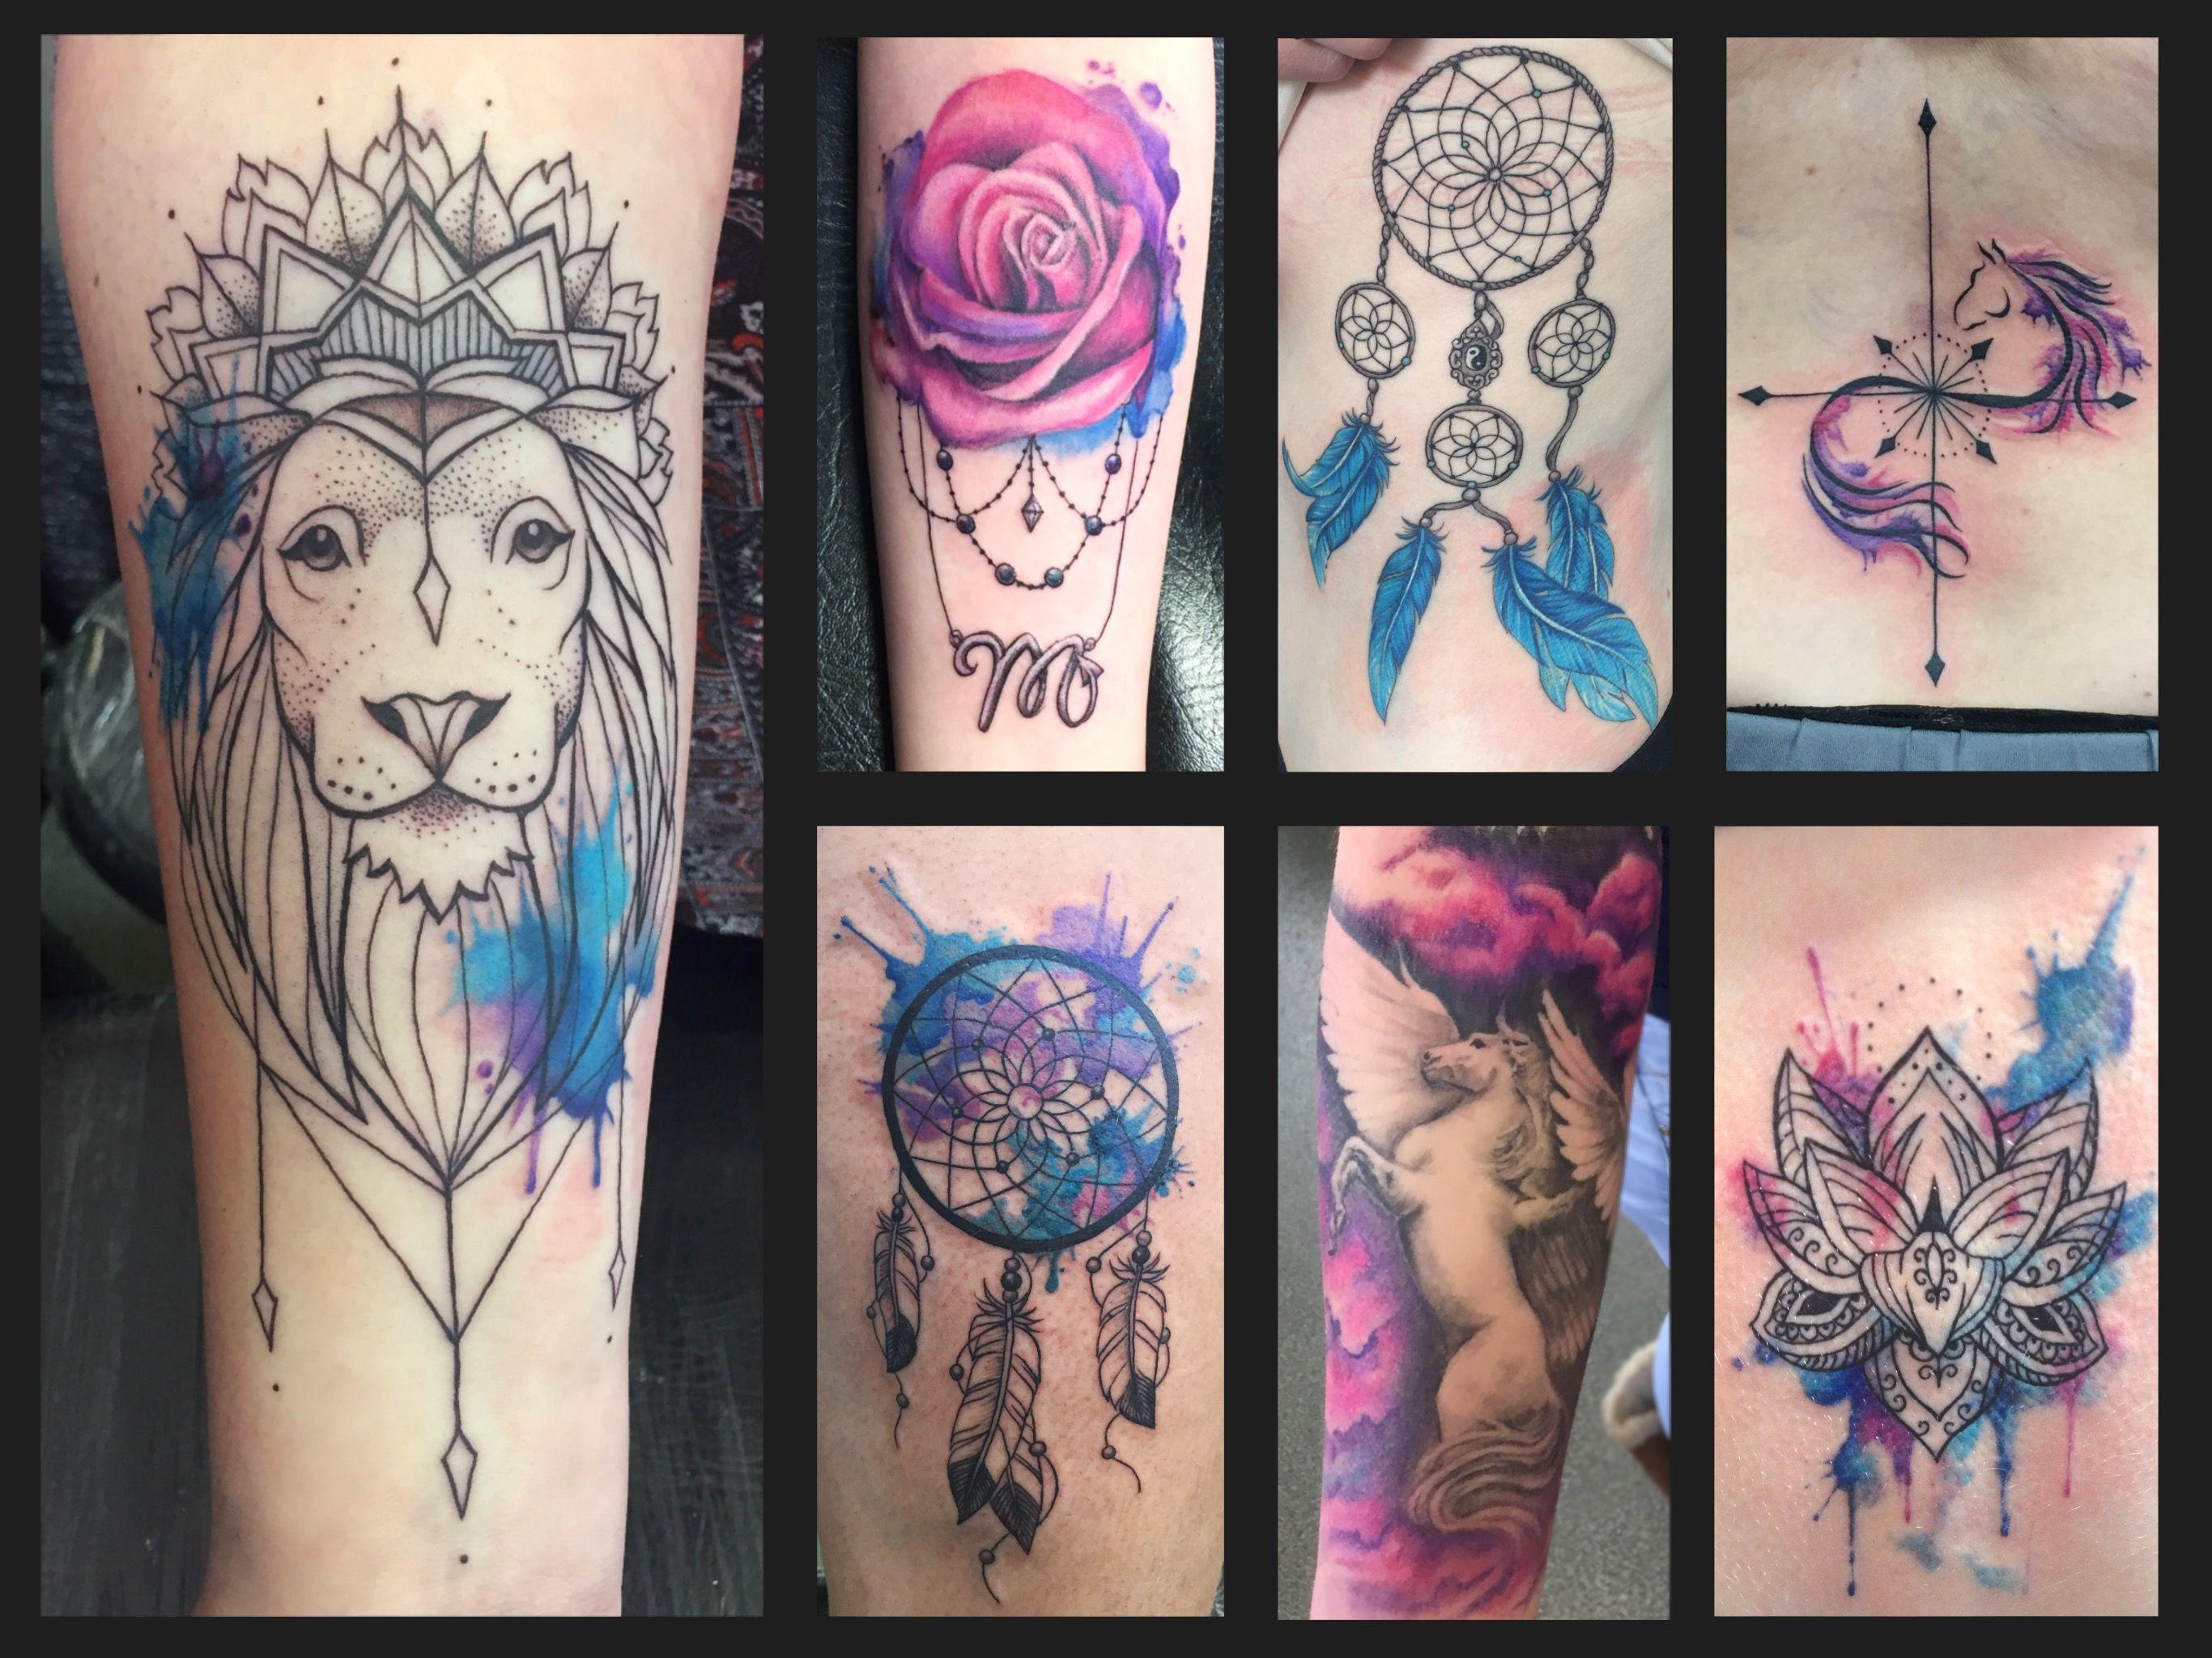 a08424e54b445 Lion watercolor tattoo, rose, dream catcher, horse, Pegasus, lotus,  pattern, pink, purple, blue, feathers